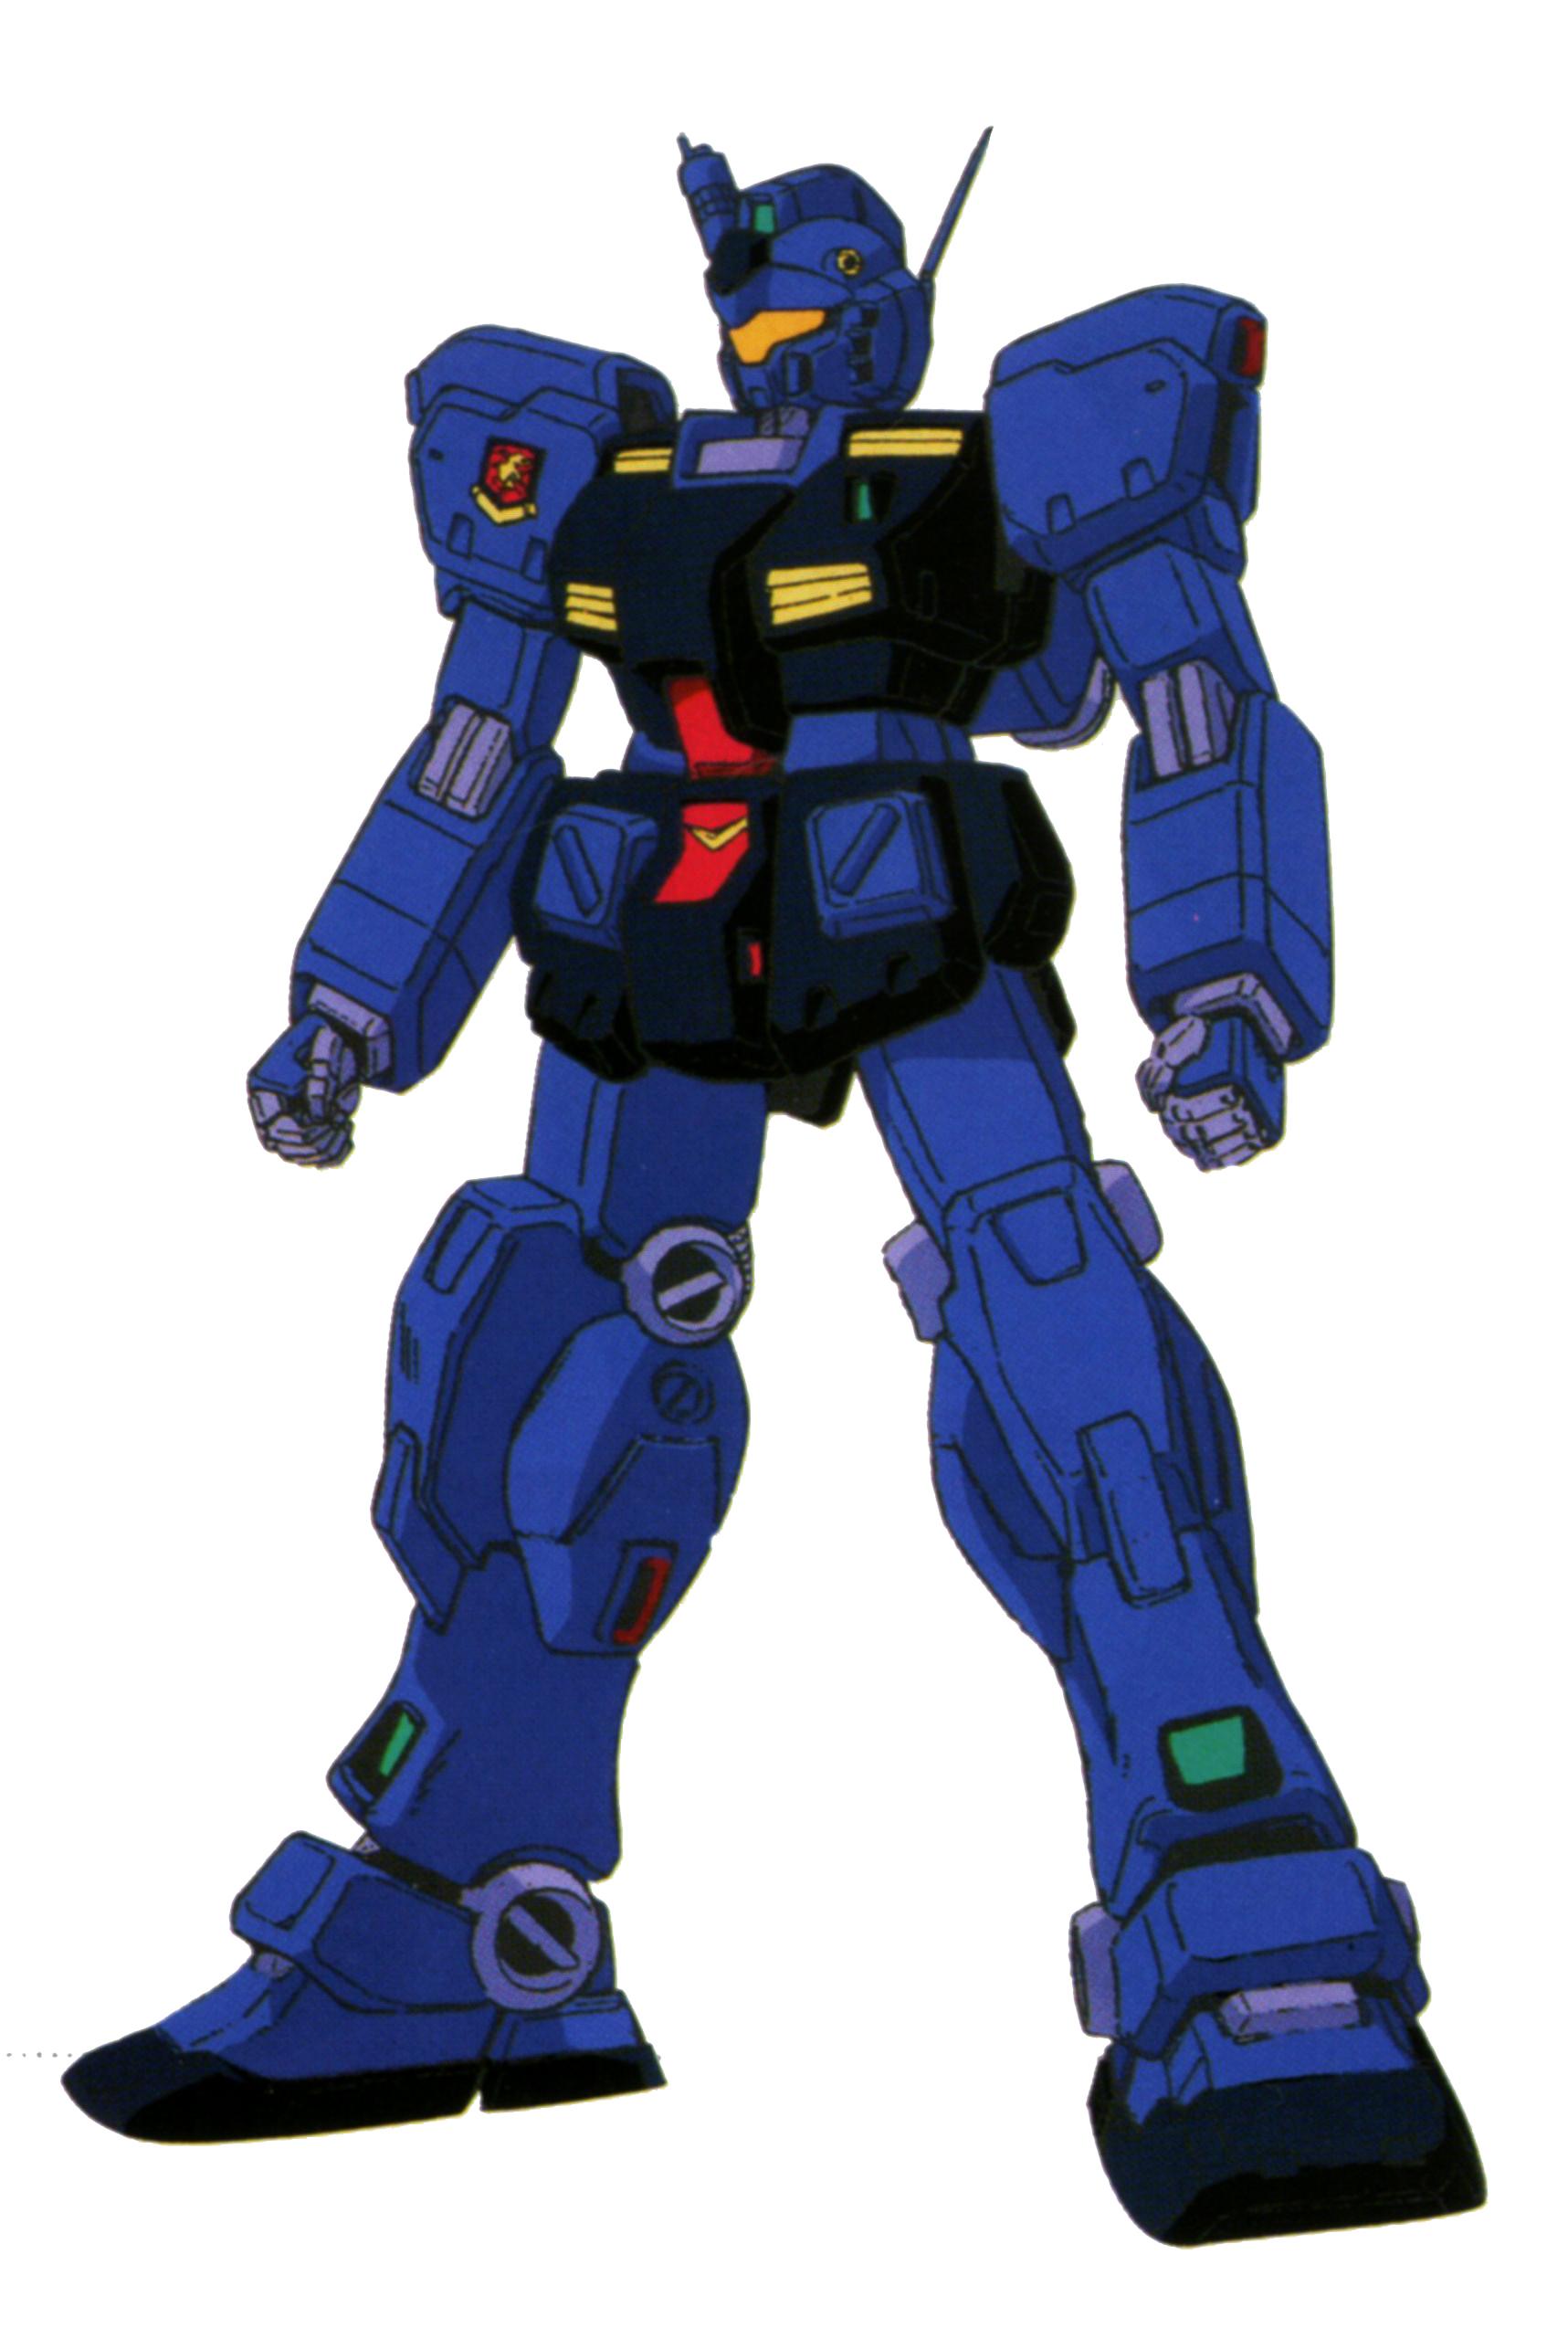 Rgm 79q Gm Quel The Gundam Wiki Fandom Powered By Wikia